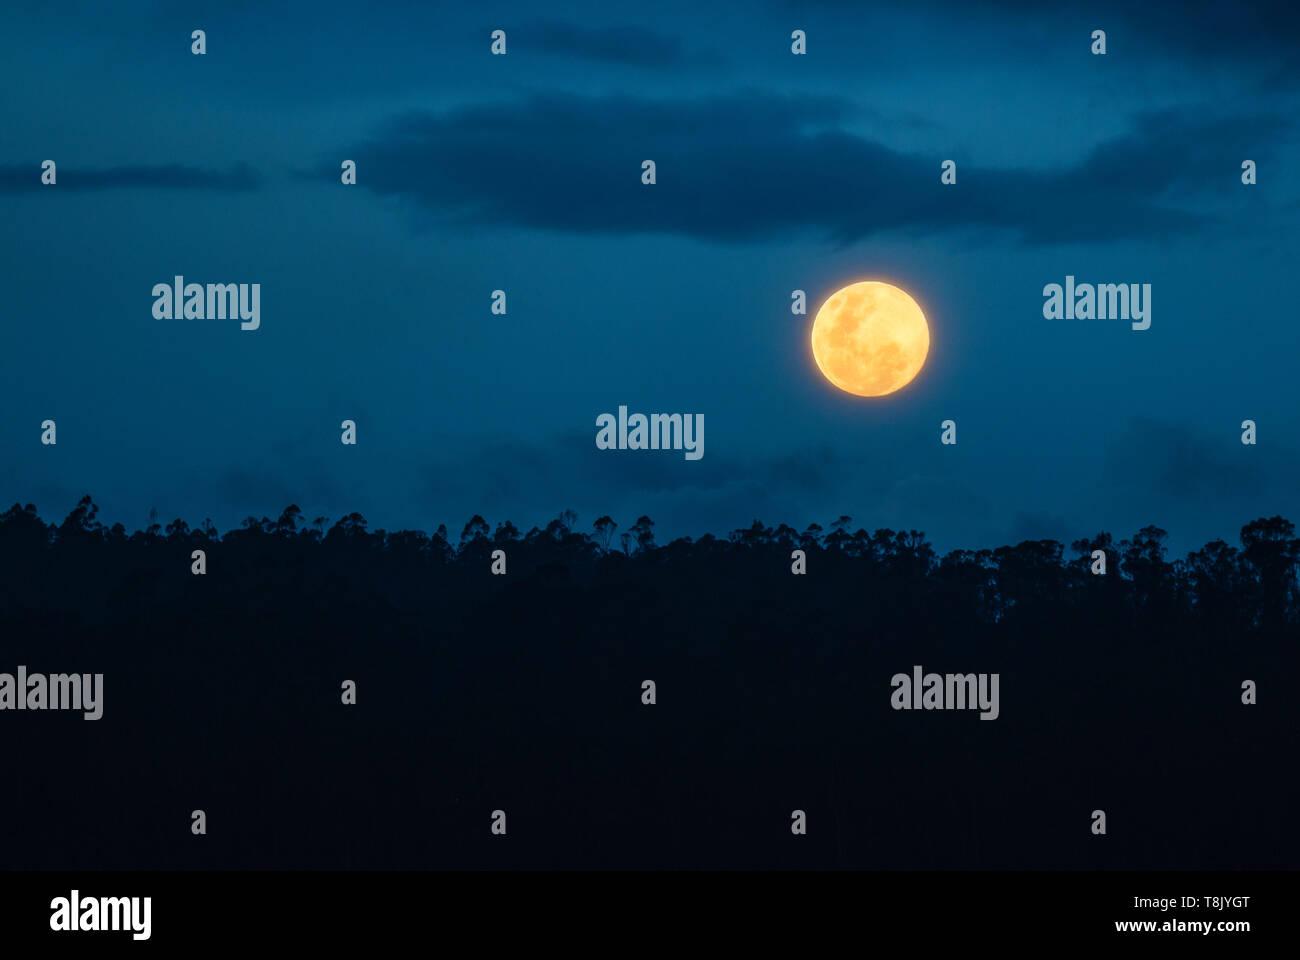 Full moon rising, Amazon Rainforest. The Amazon river comprises the countries of Brazil, Bolivia, Colombia, Ecuador, Guyana, Suriname, Peru, Venezuela. - Stock Image